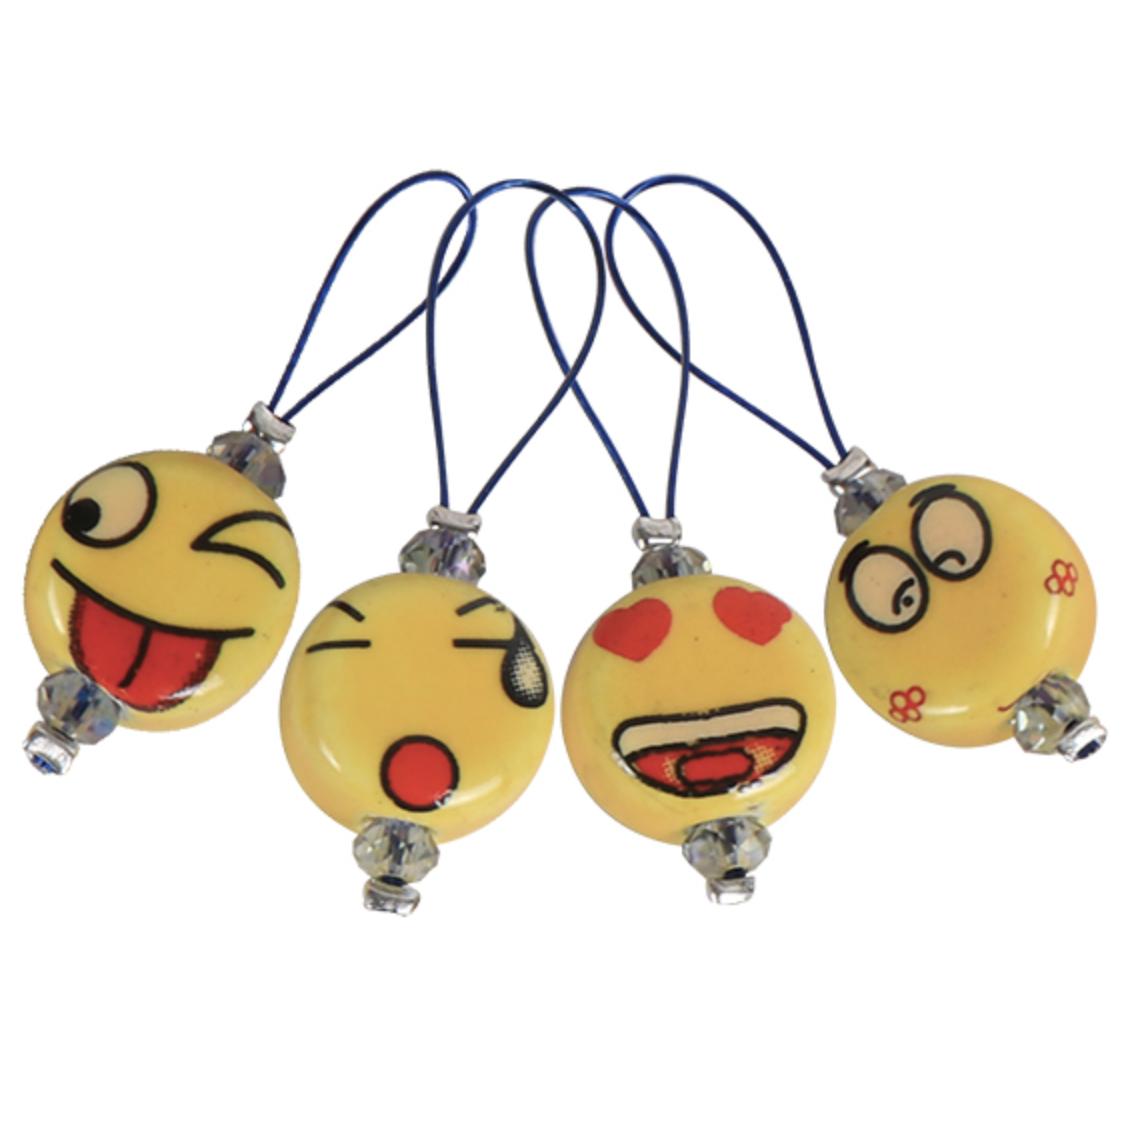 KnitPro 12 pieces stitch markers Smileys